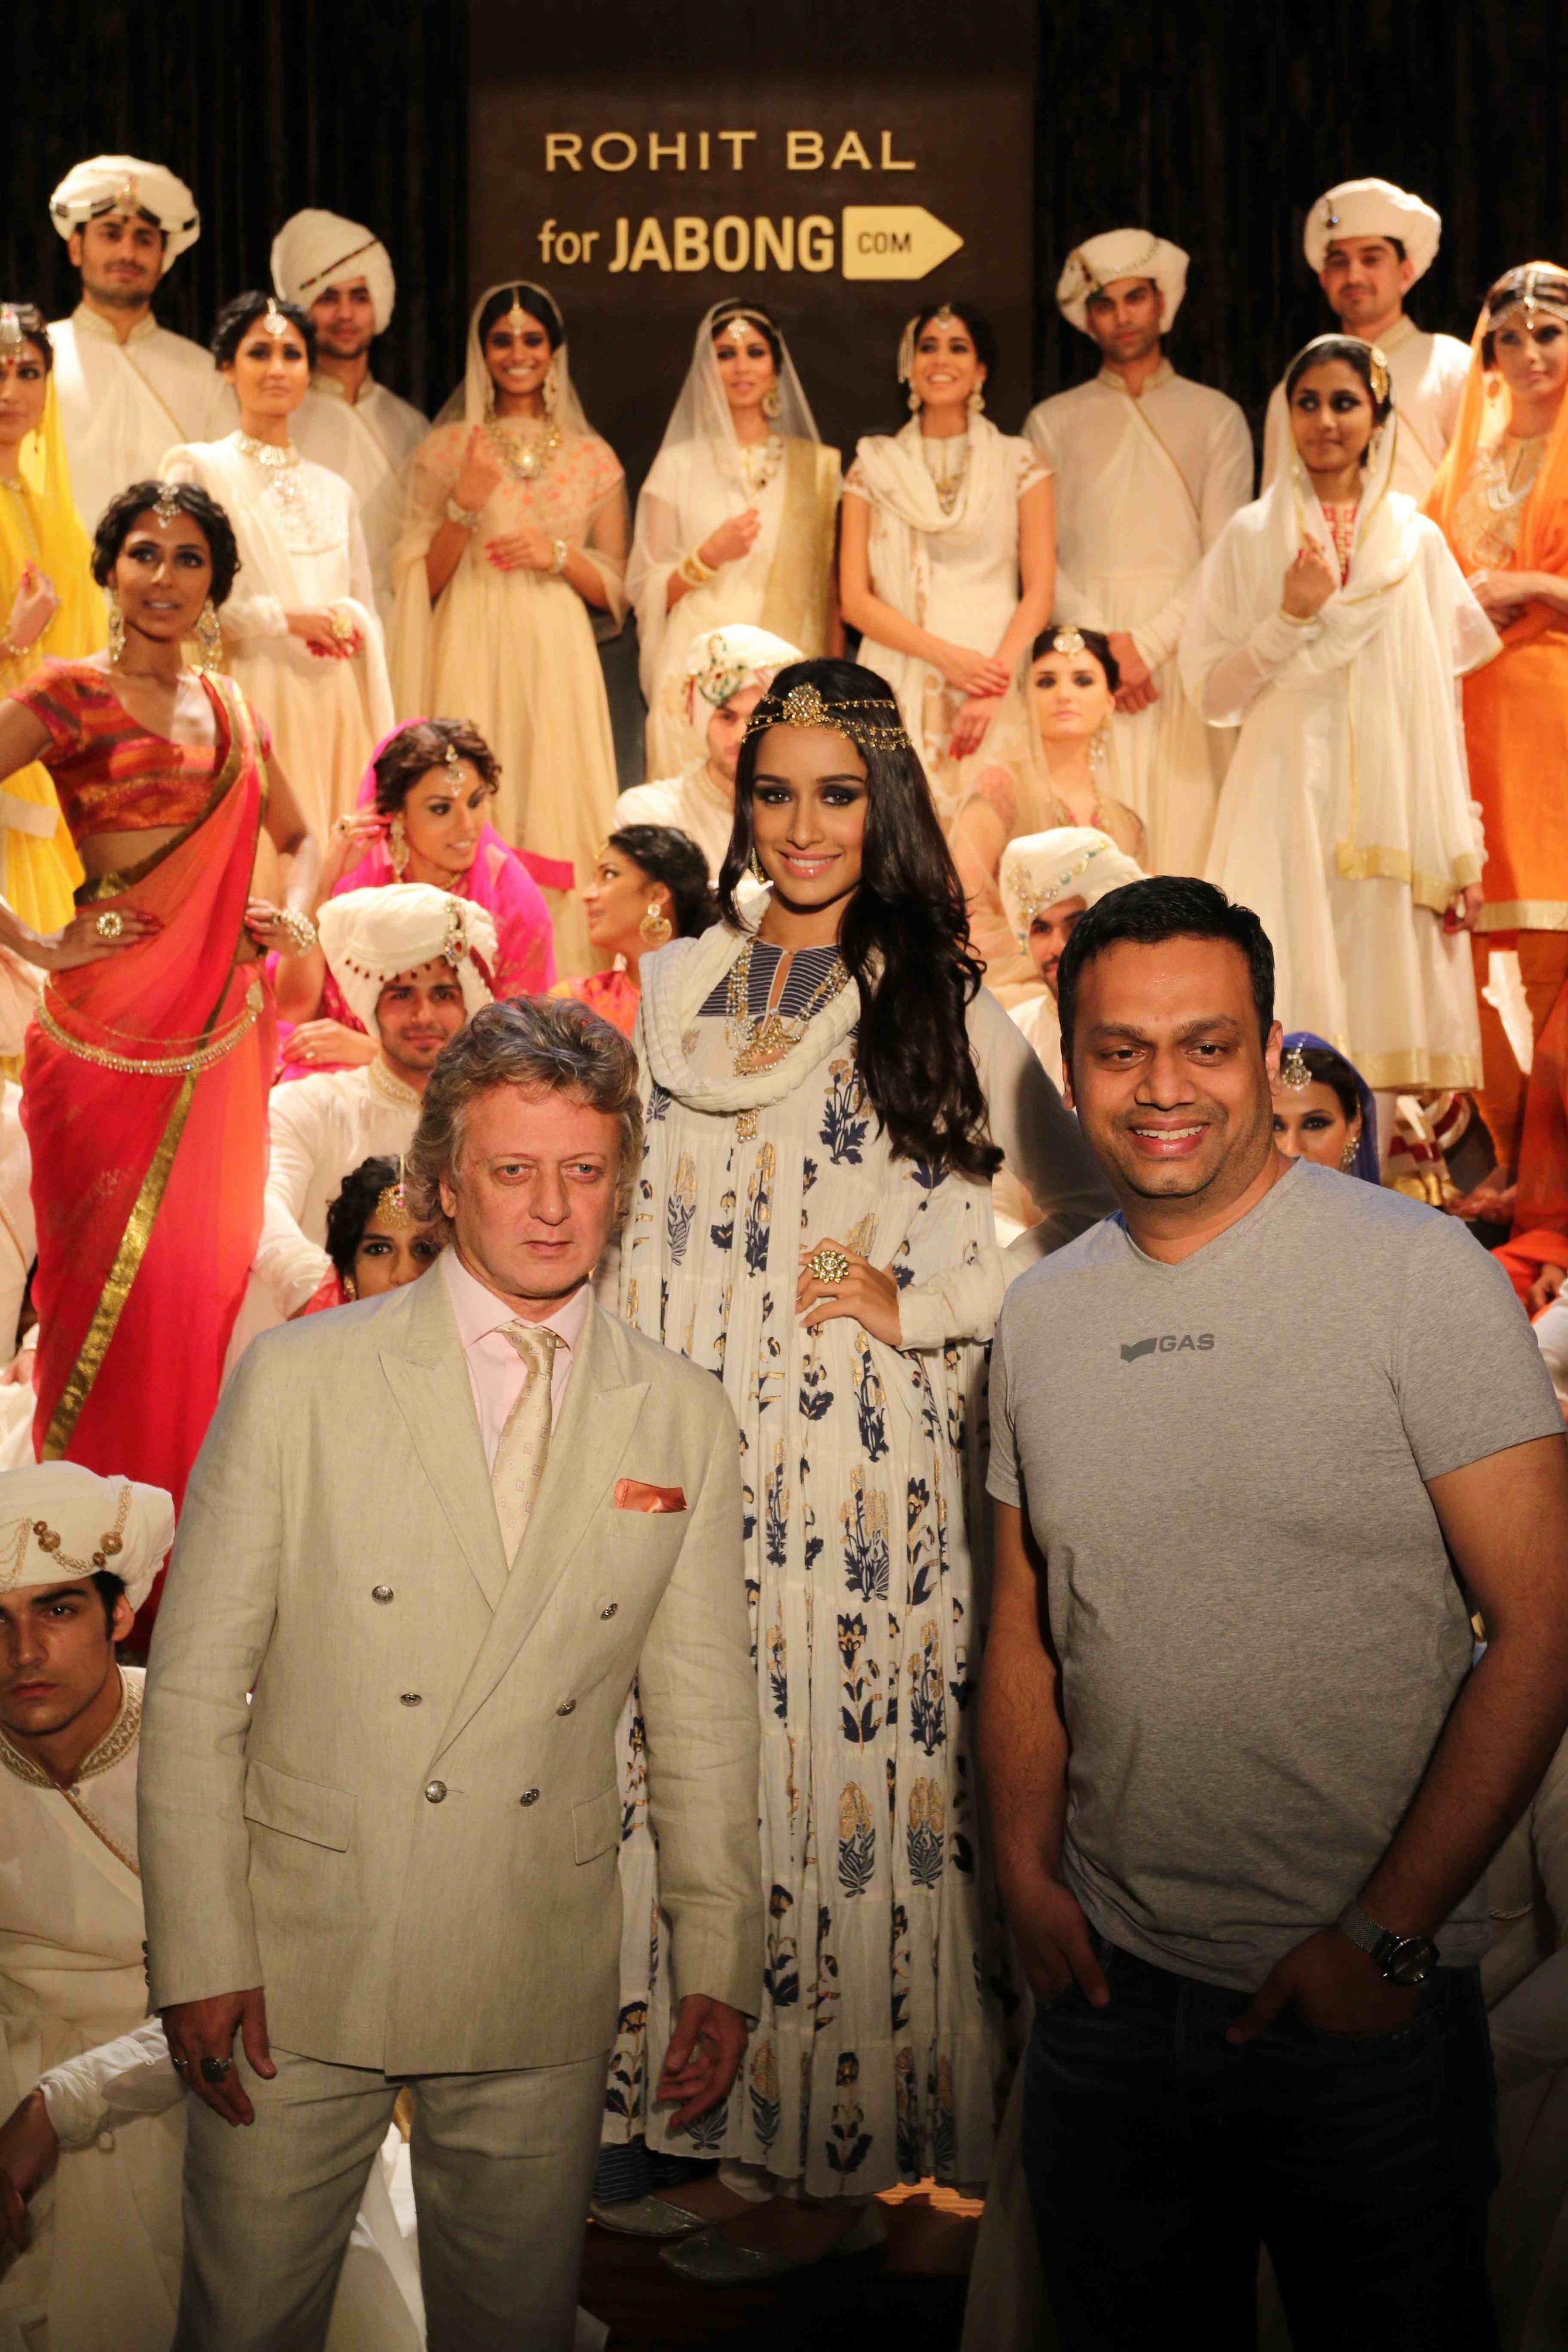 Rohit Bal, Shraddha Kapoor and Arun Chandra Mohan - Founder & CEO, Jabon....jpg